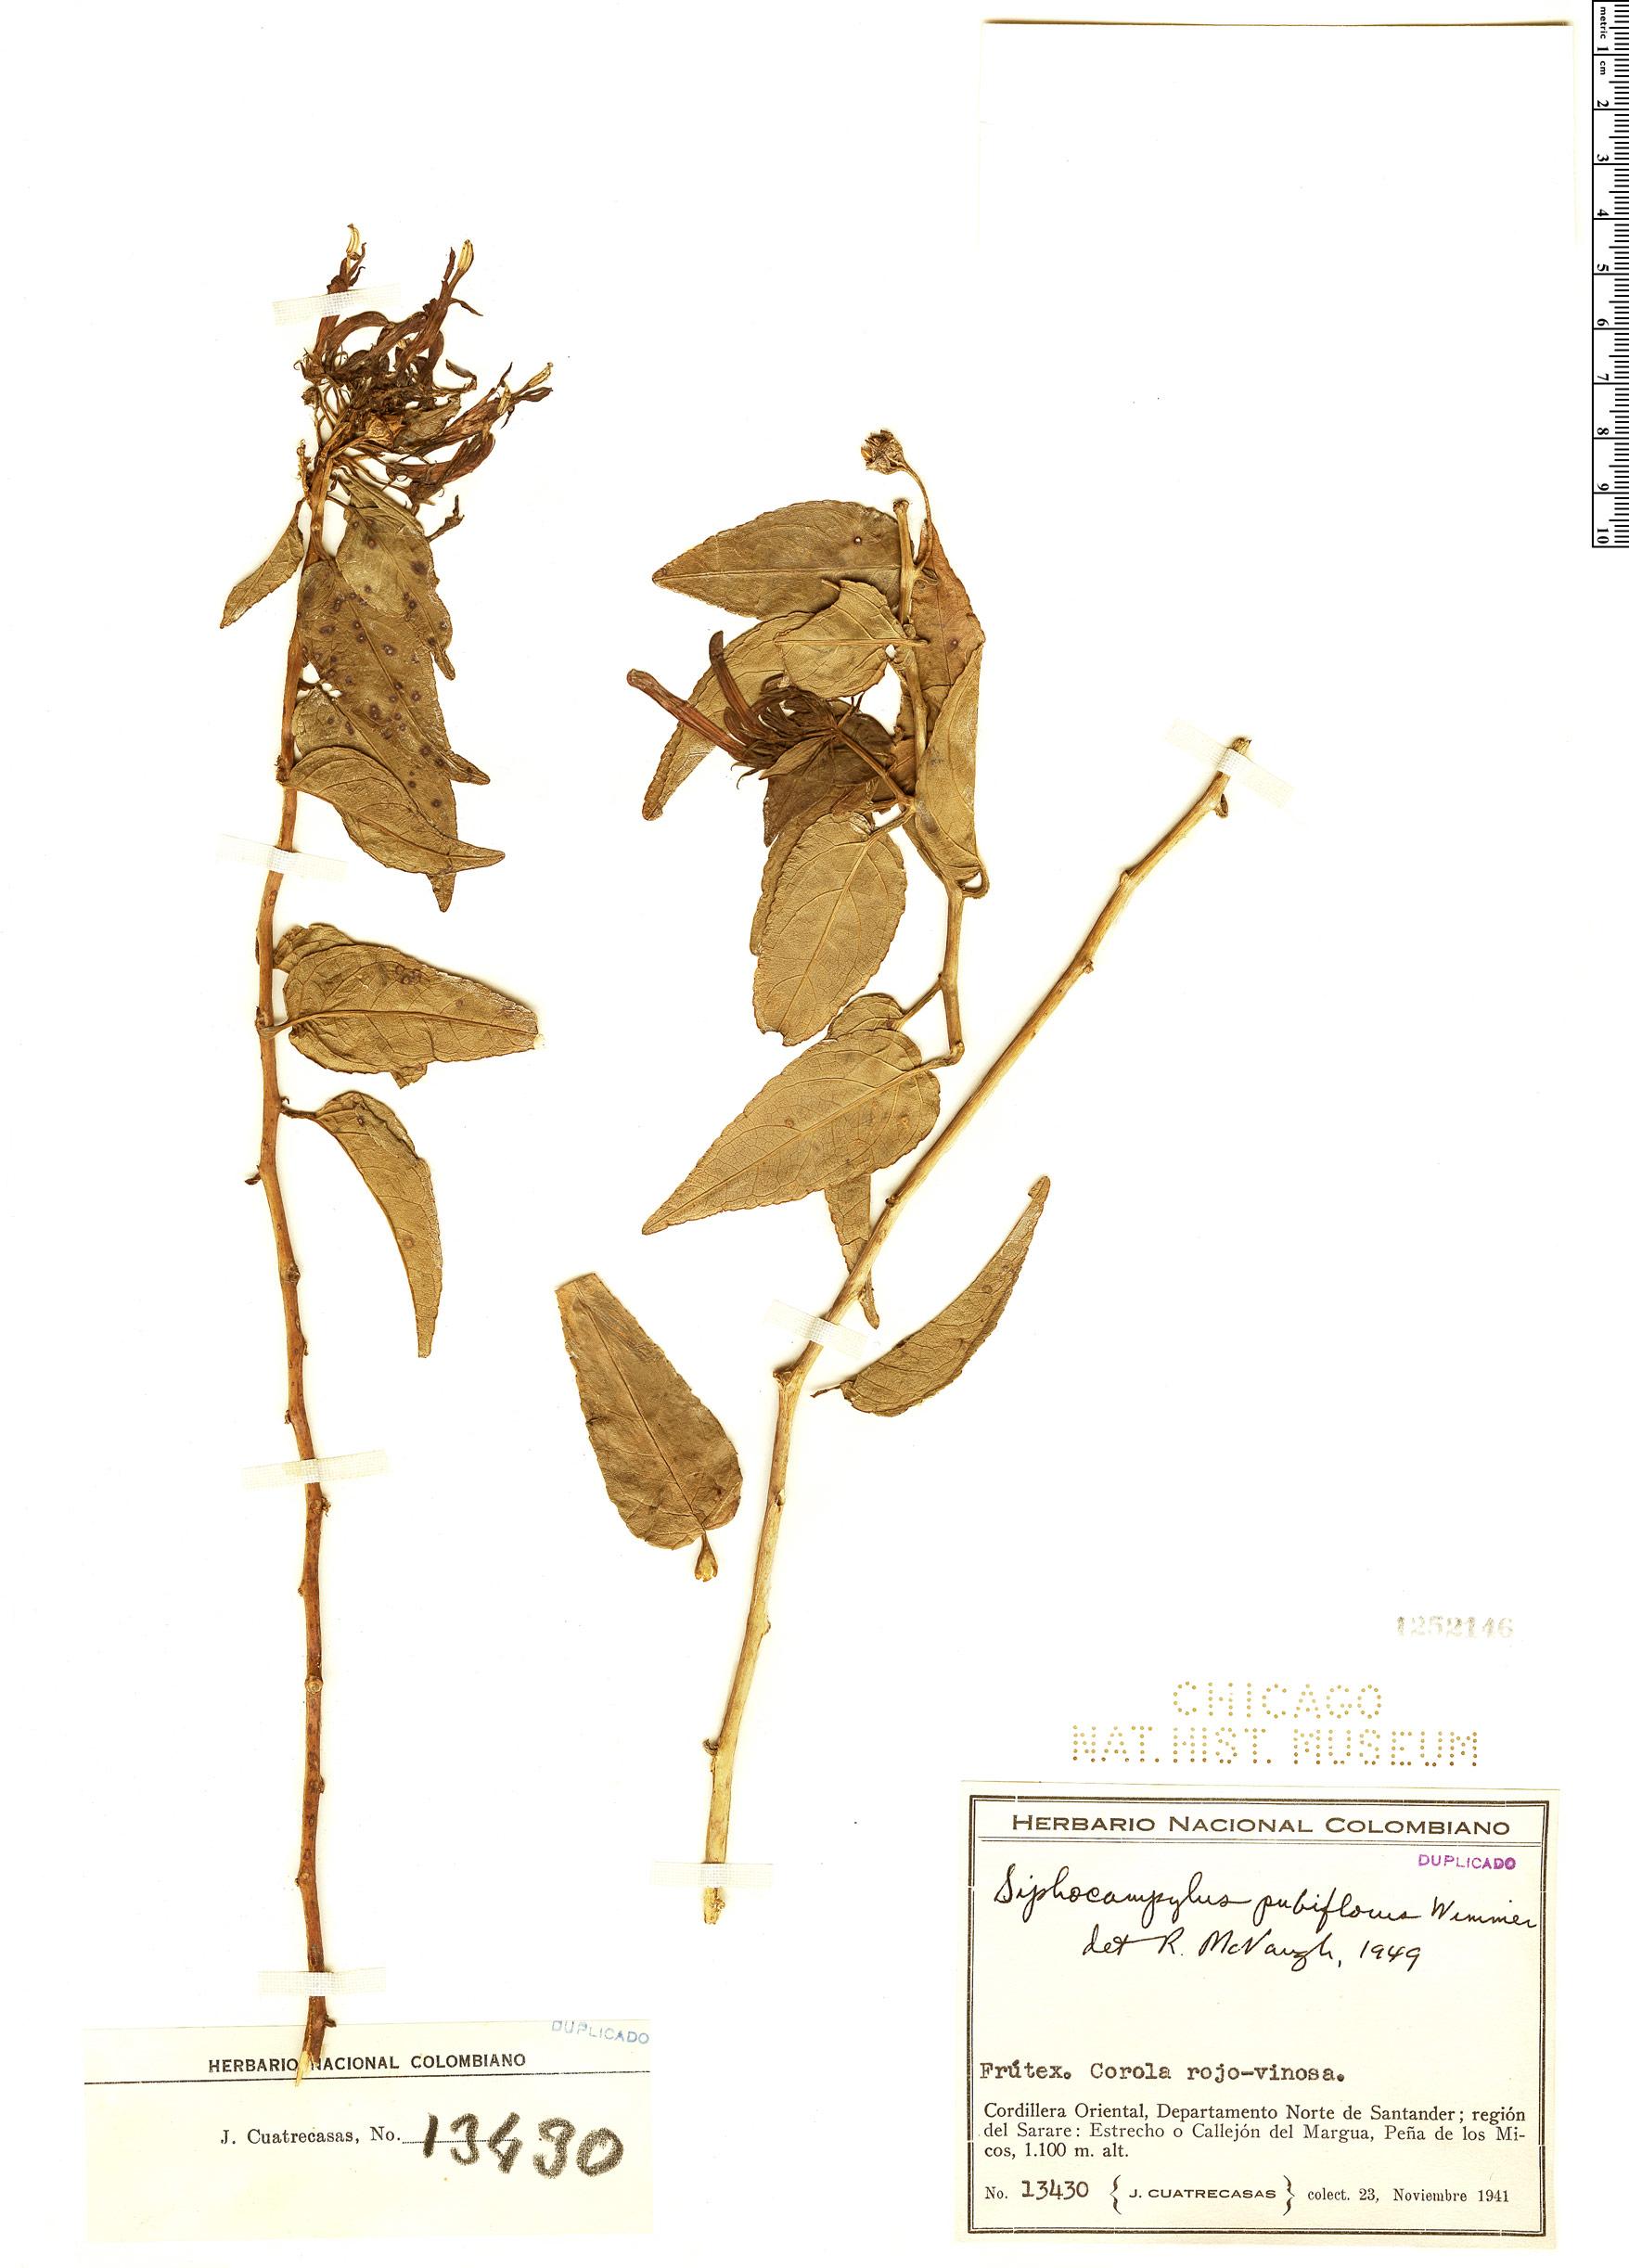 Specimen: Siphocampylus pubiflorus